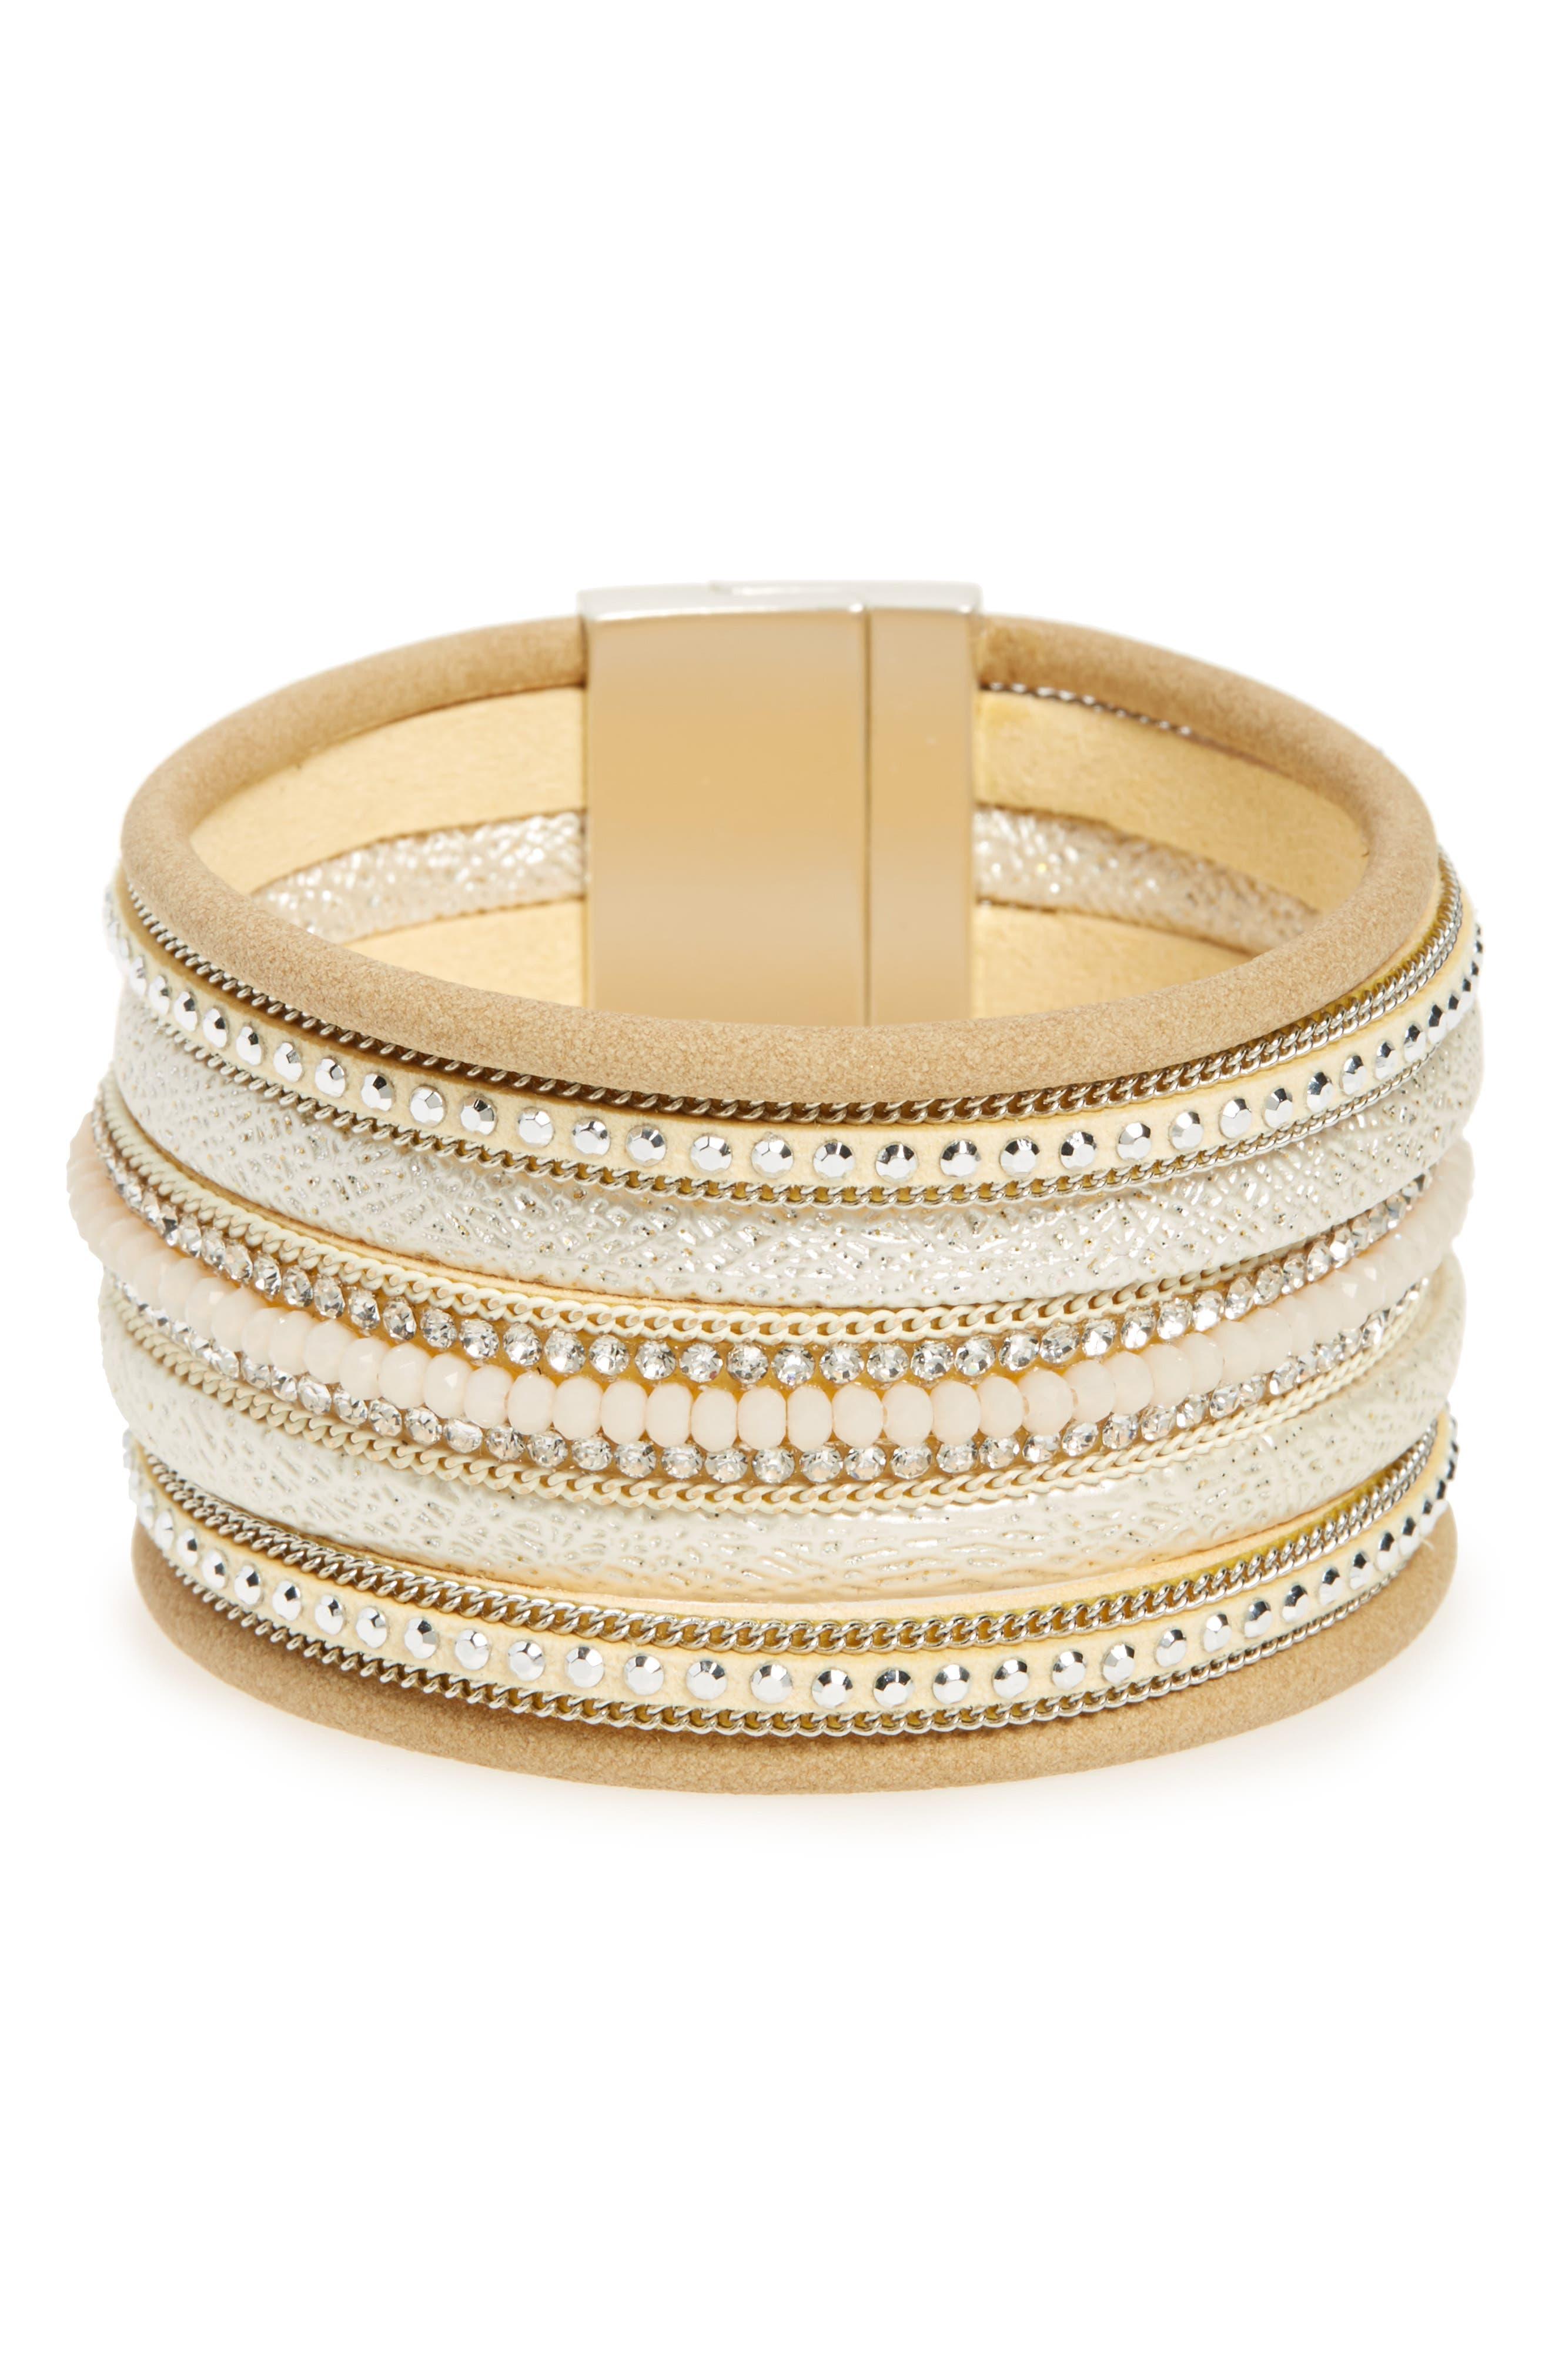 Multirow Bracelet,                         Main,                         color, Brown/ Multi